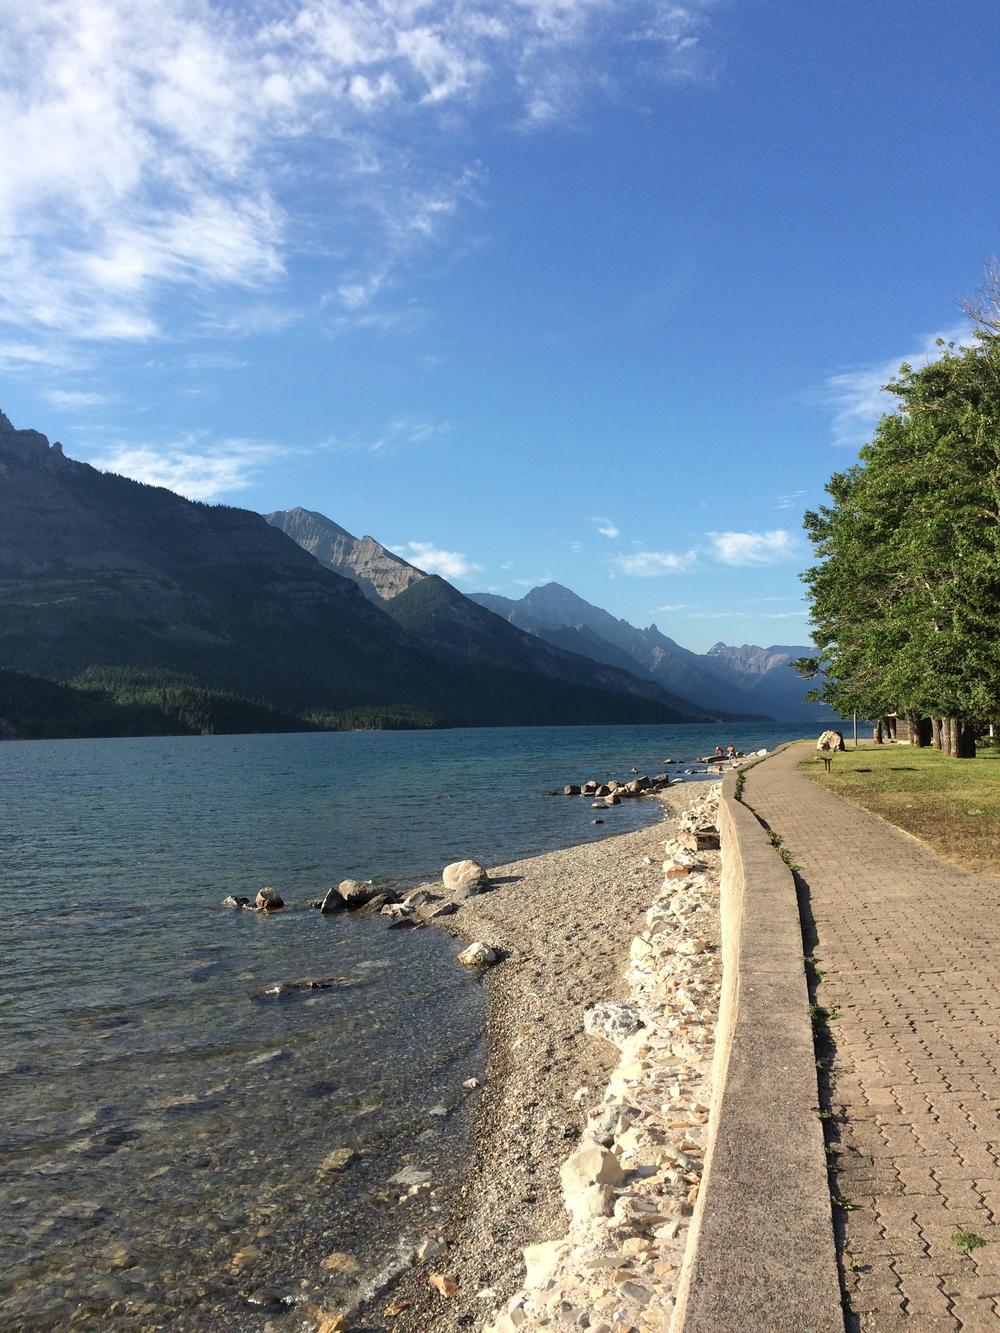 Photo #3: Waterton Lakes, Glacier National Park, Alberta, Canada